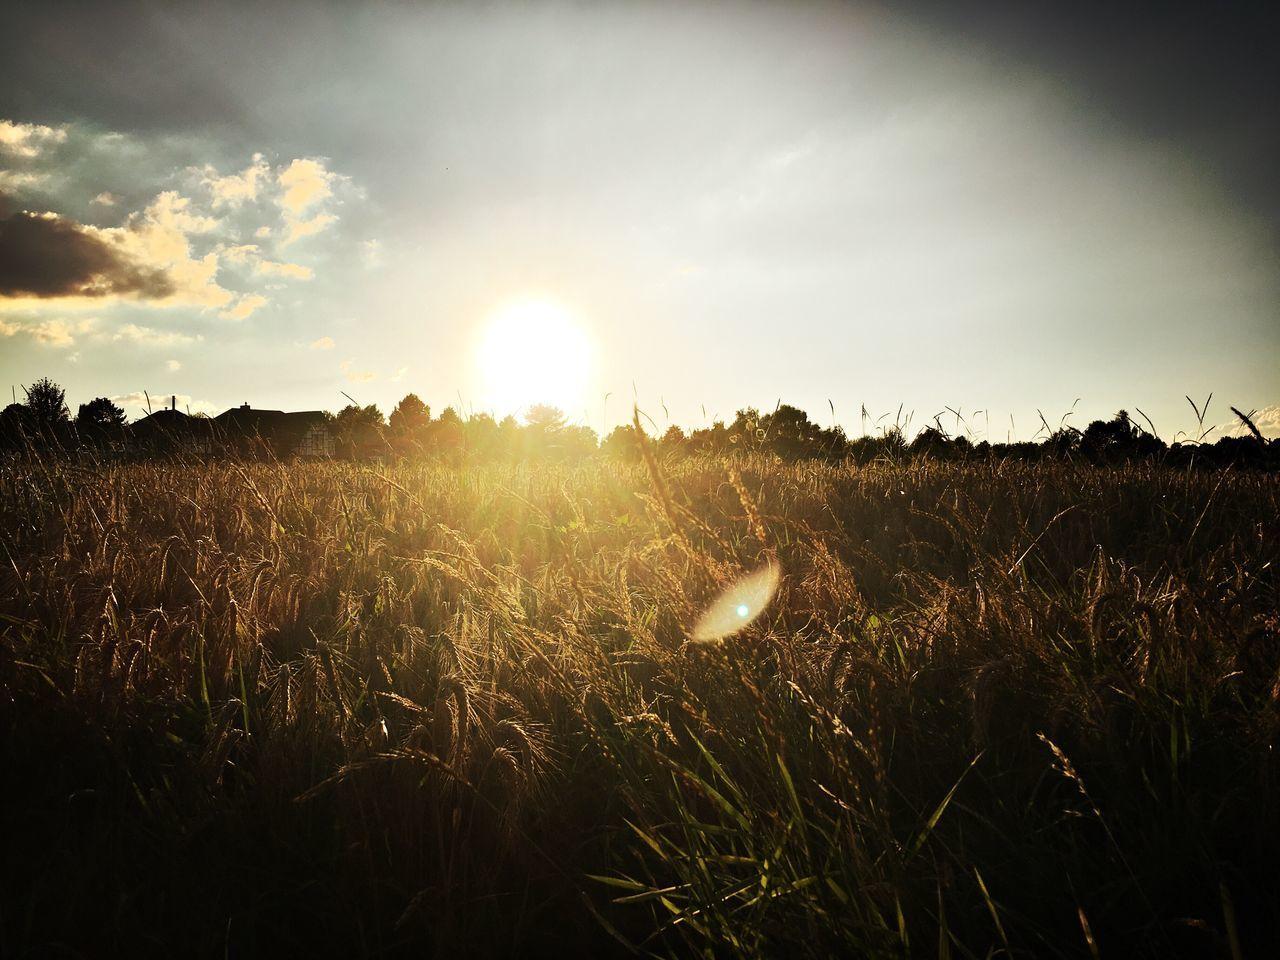 Niederrhein Germany Summer Fields Harvest Time Sunset Sunset #sun #clouds #skylovers #sky #nature #beautifulinnature #naturalbeauty #photography #landscape Summer Summer Sunset Nature Landscape_photography Landscape_Collection Landscape Nature Photography Harvest EyeEm Nature Lover